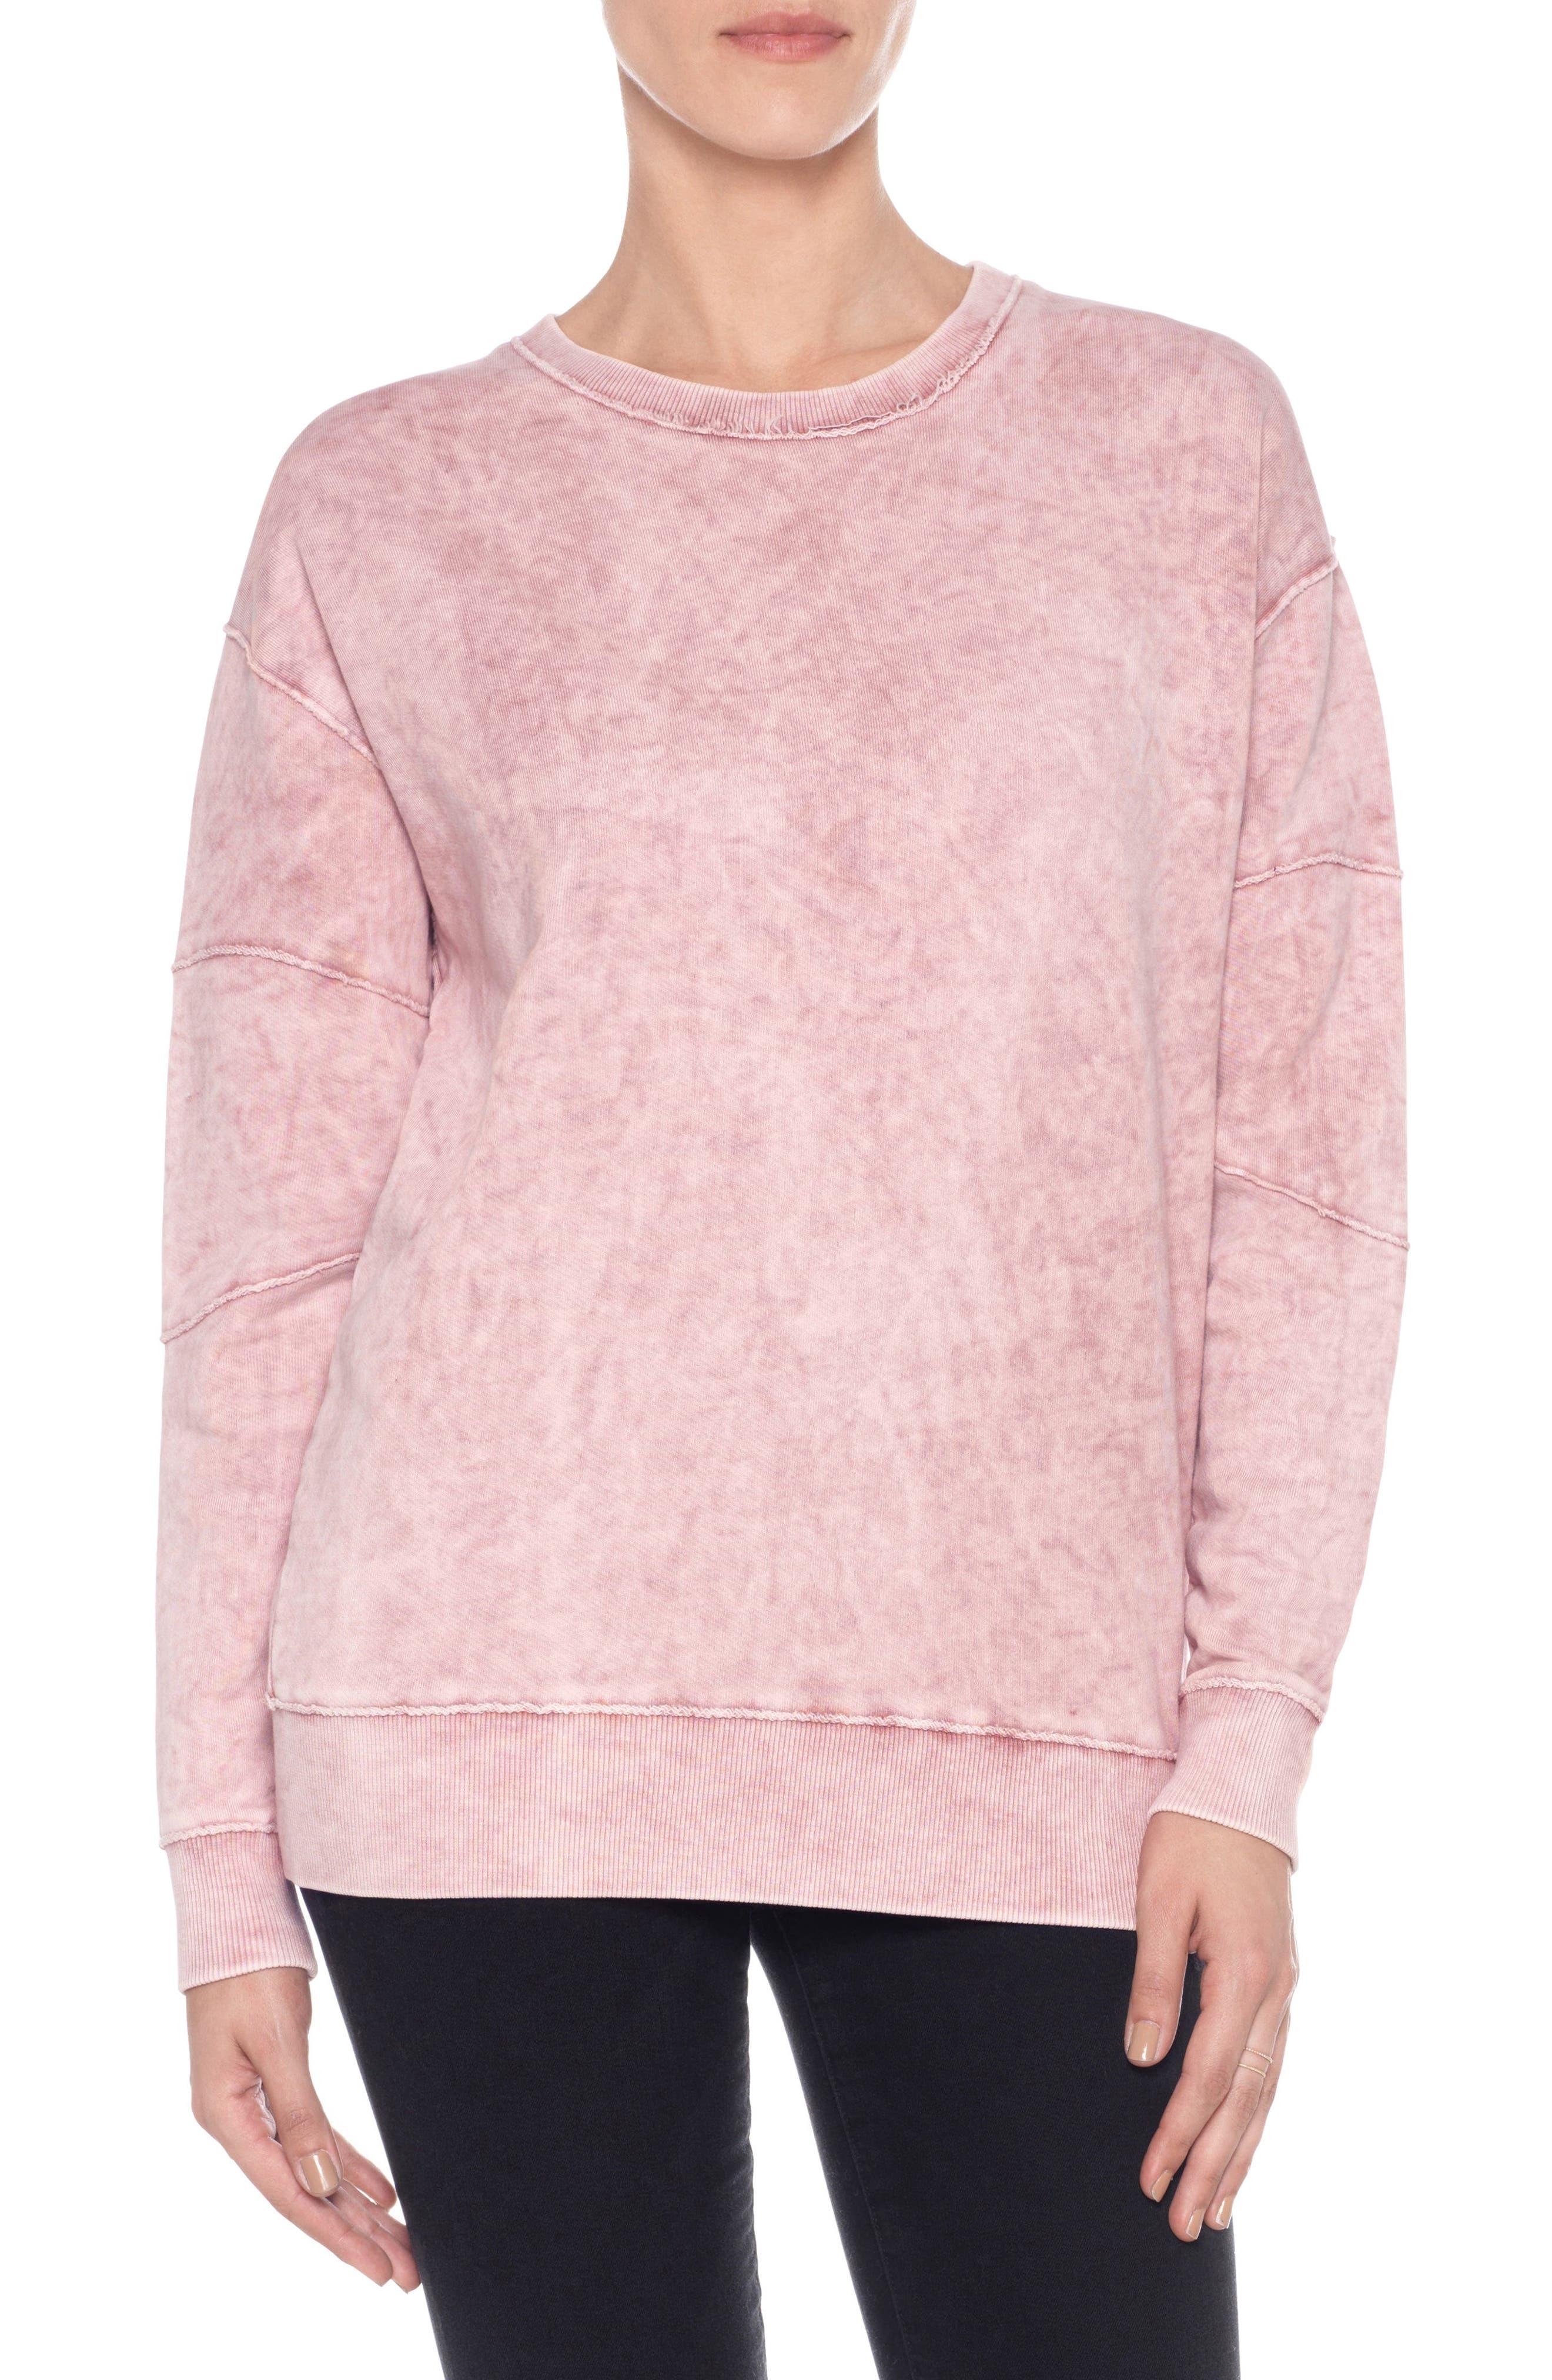 Joe's Kendall Sweatshirt